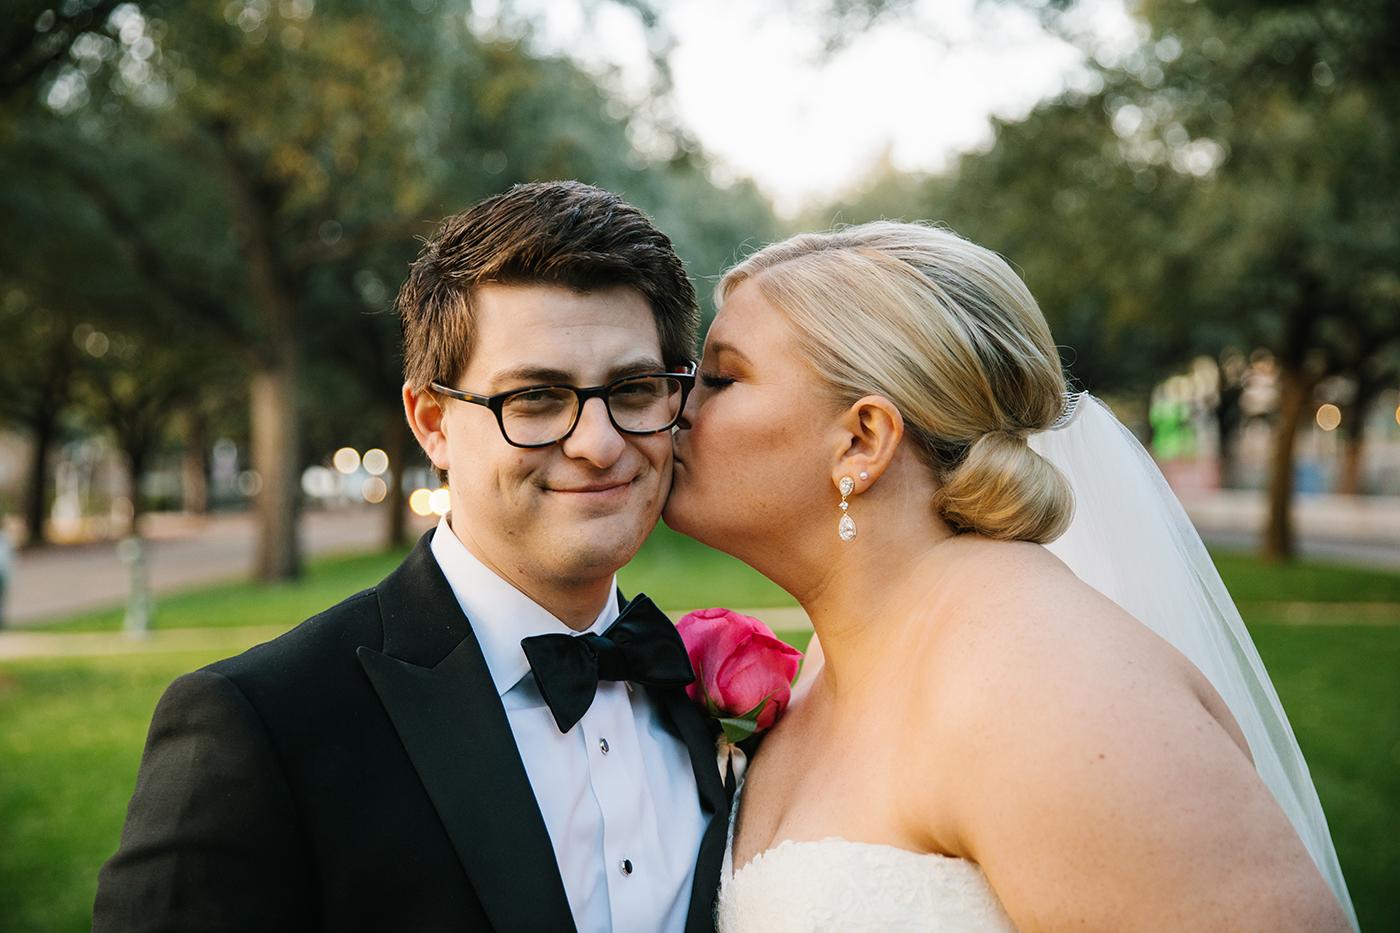 Dallas Weddings Planner - Allday Events - Katie + Matthew at The Adolphus Hotel - 486.jpg